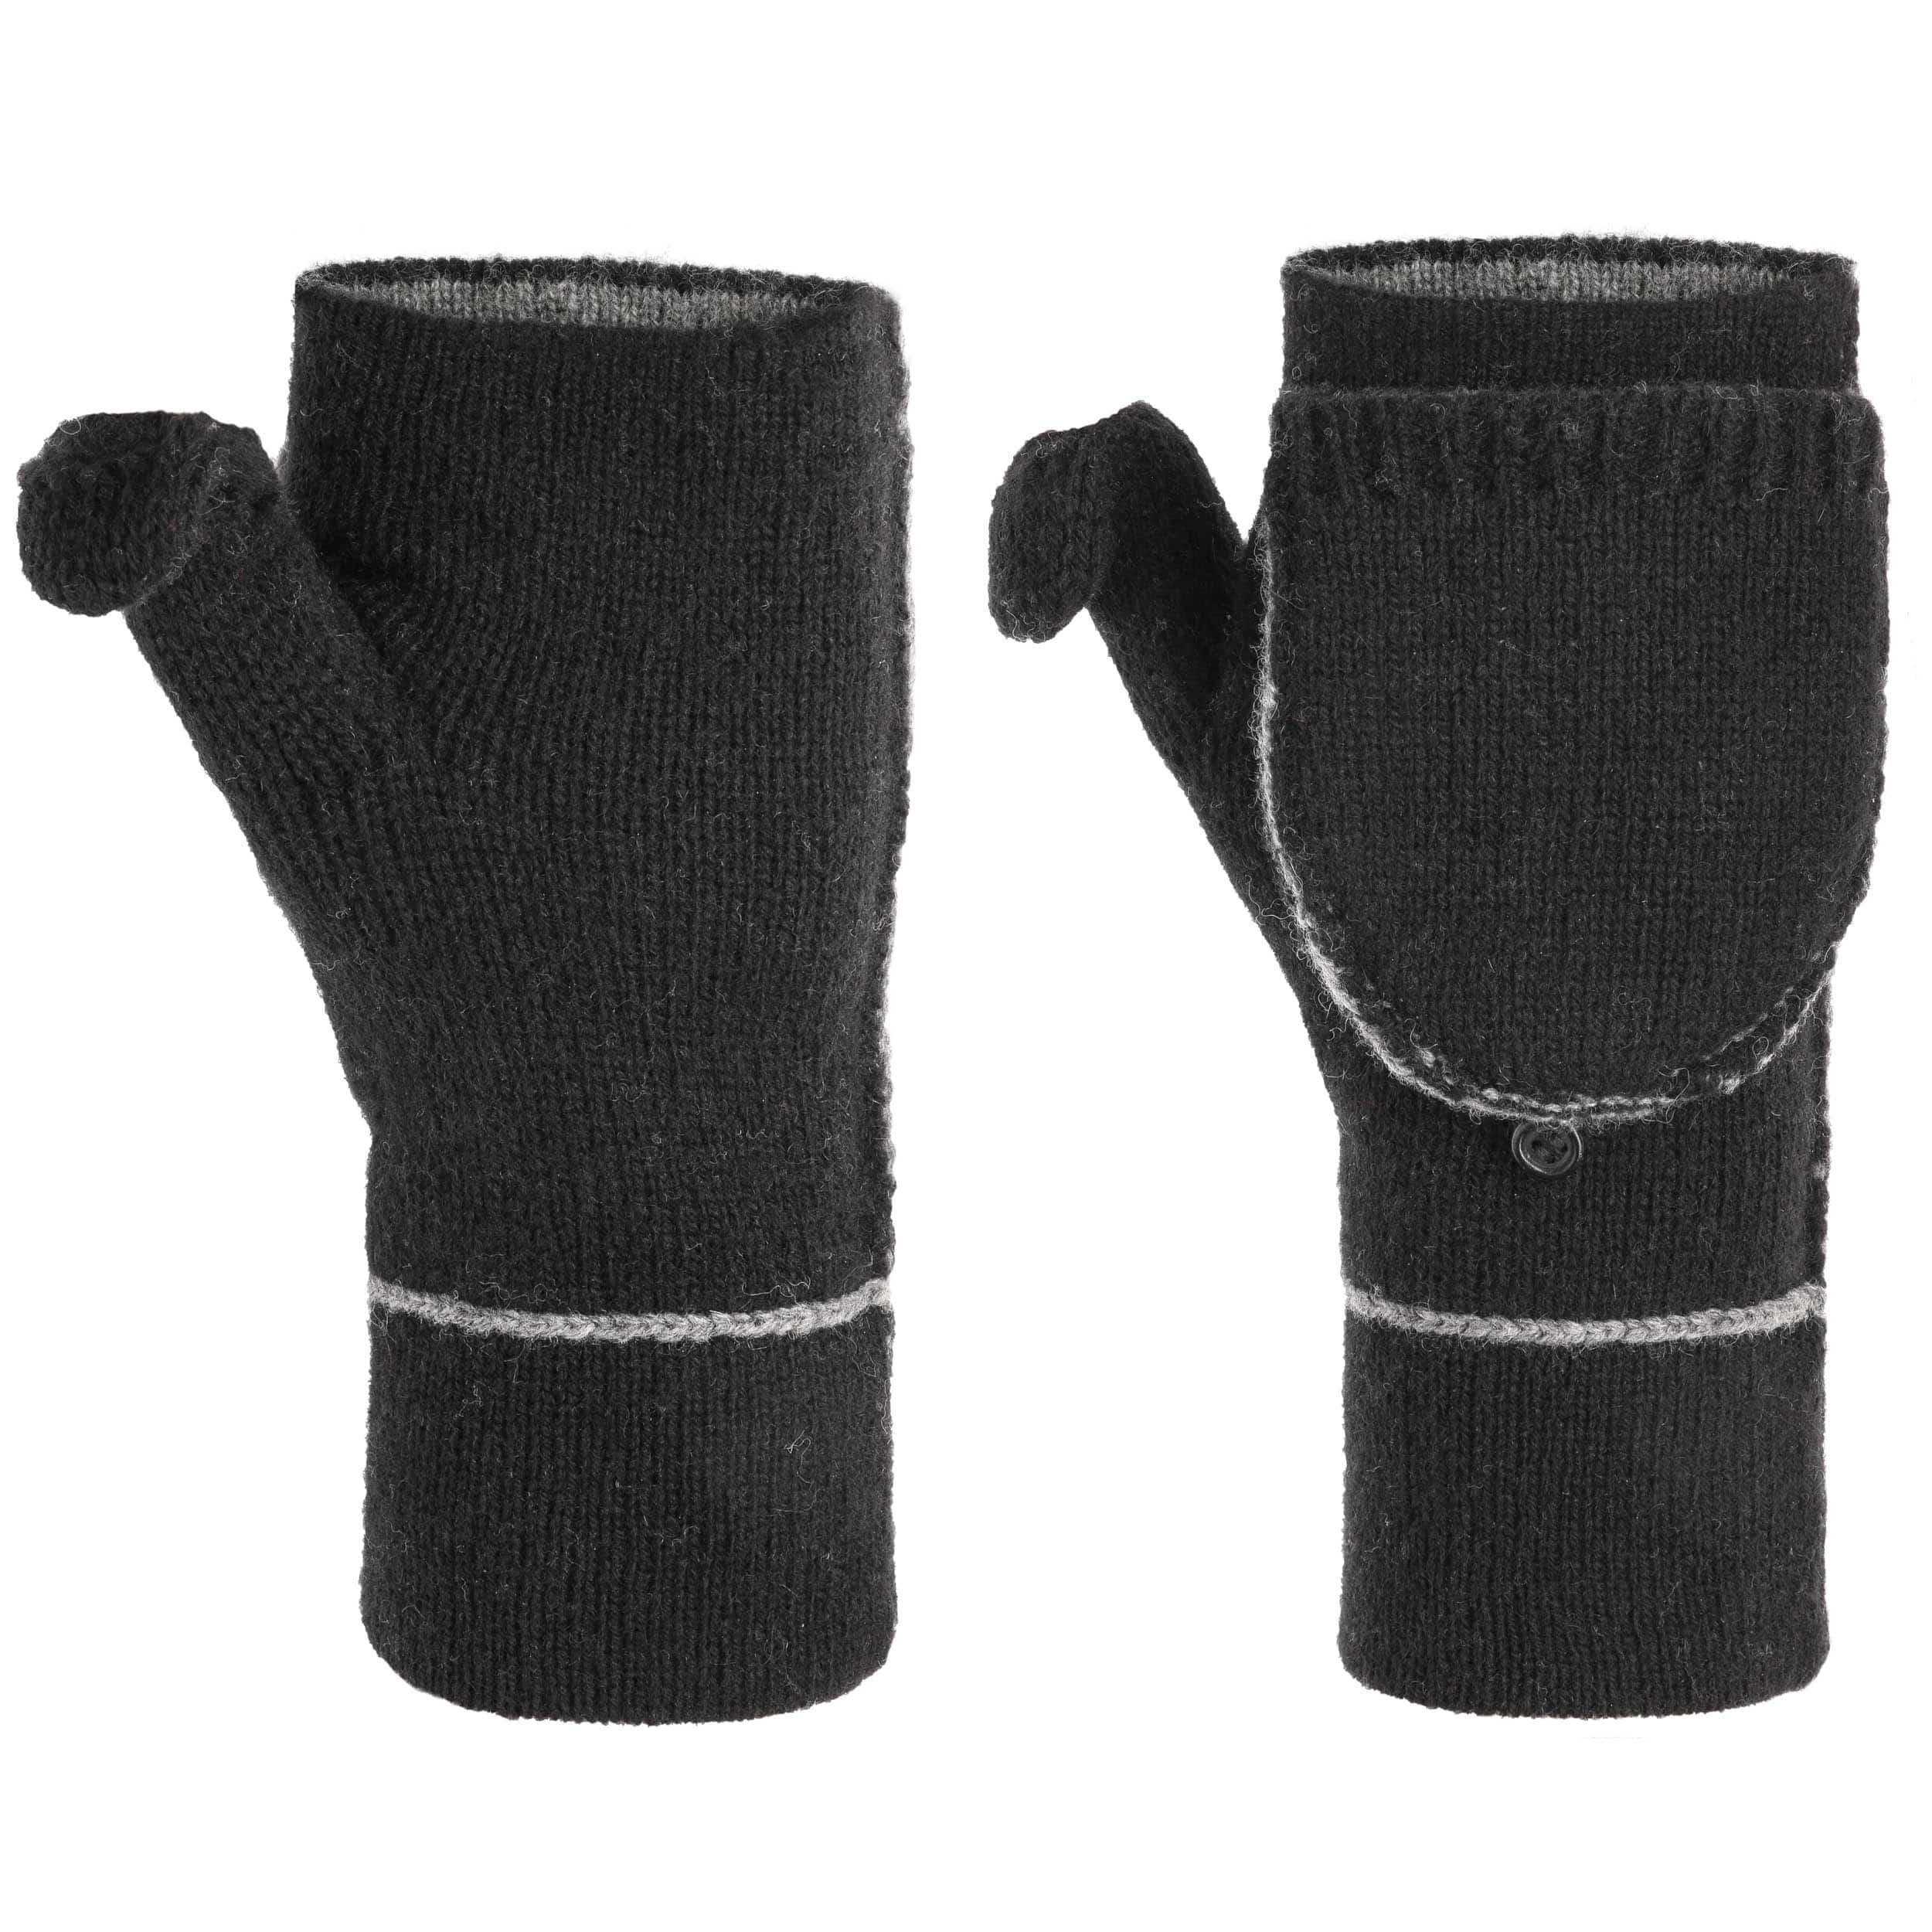 gants ugg